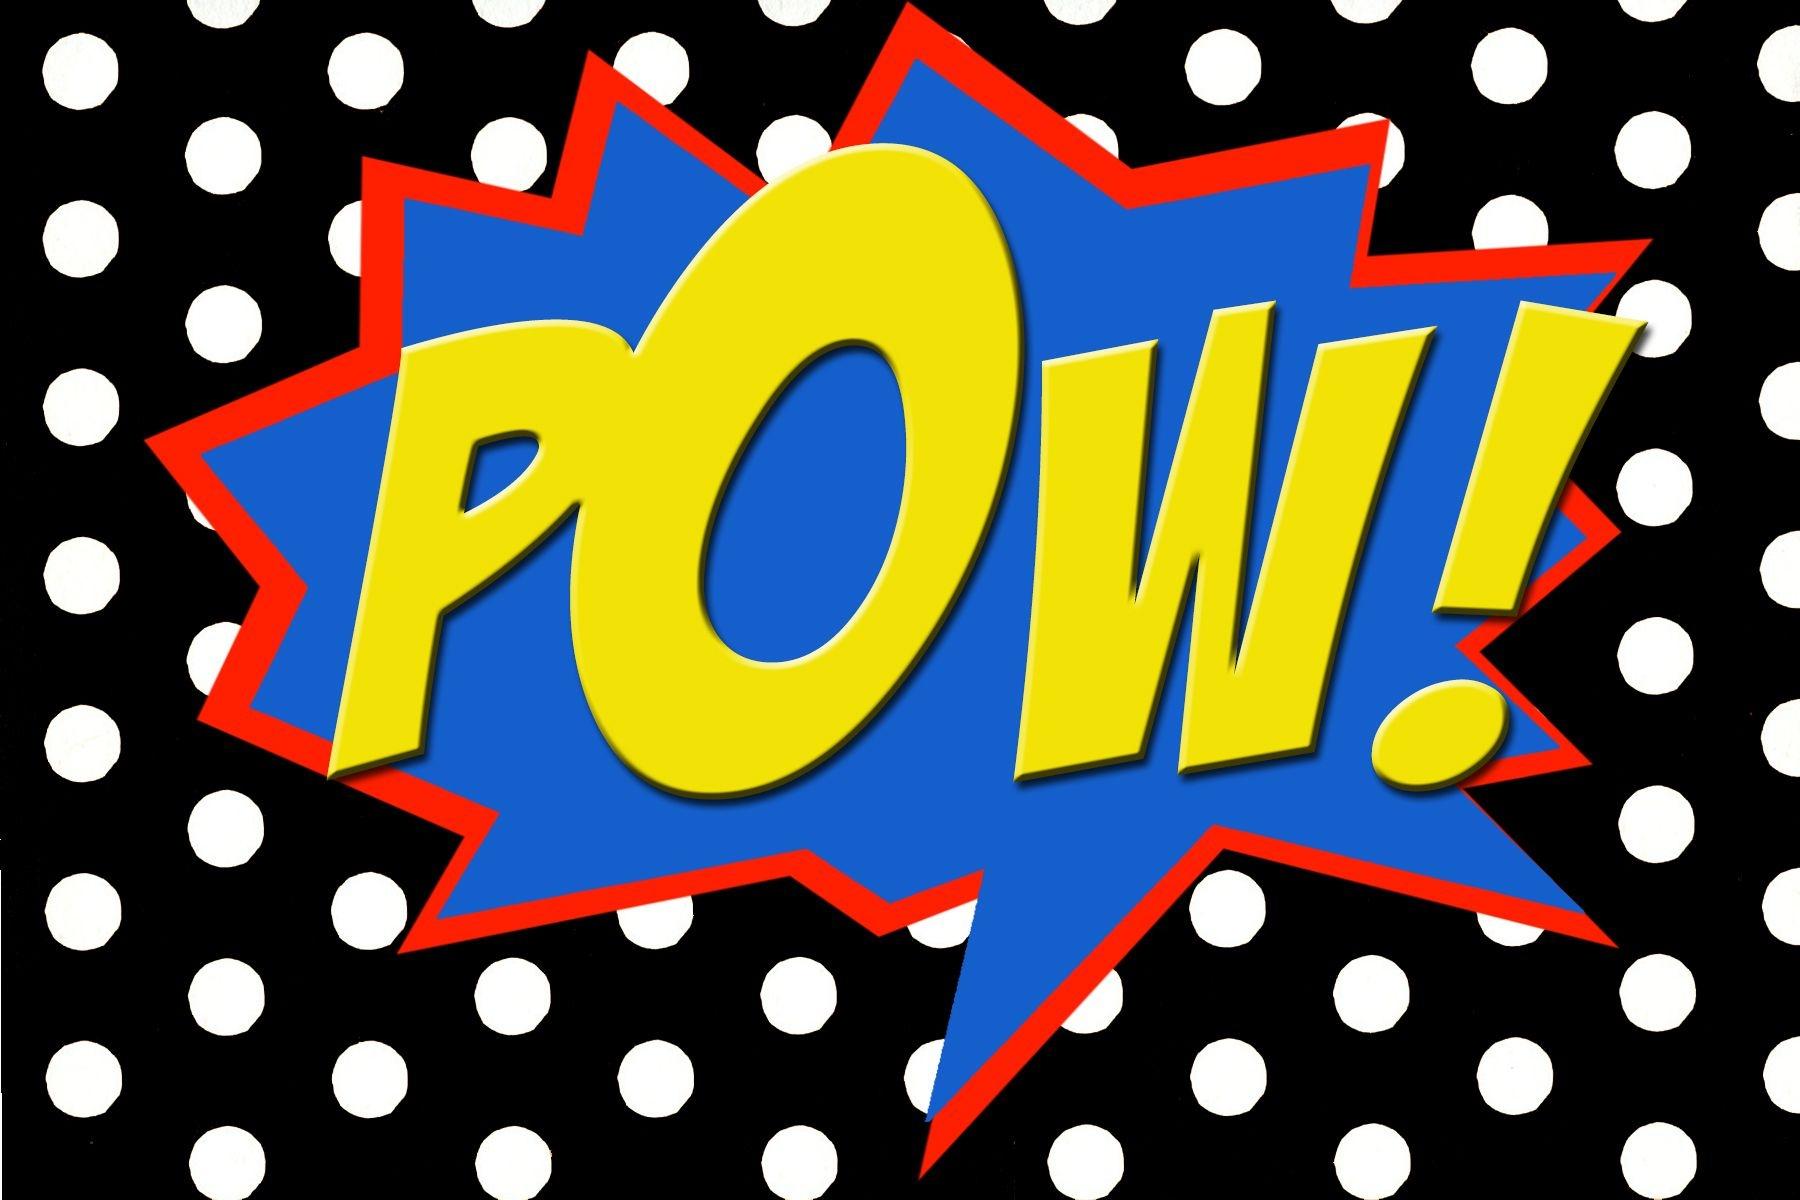 Free Printable Pow! Comic Book Word. | Super Hero Party In 2019 - Free Printable Superhero Words